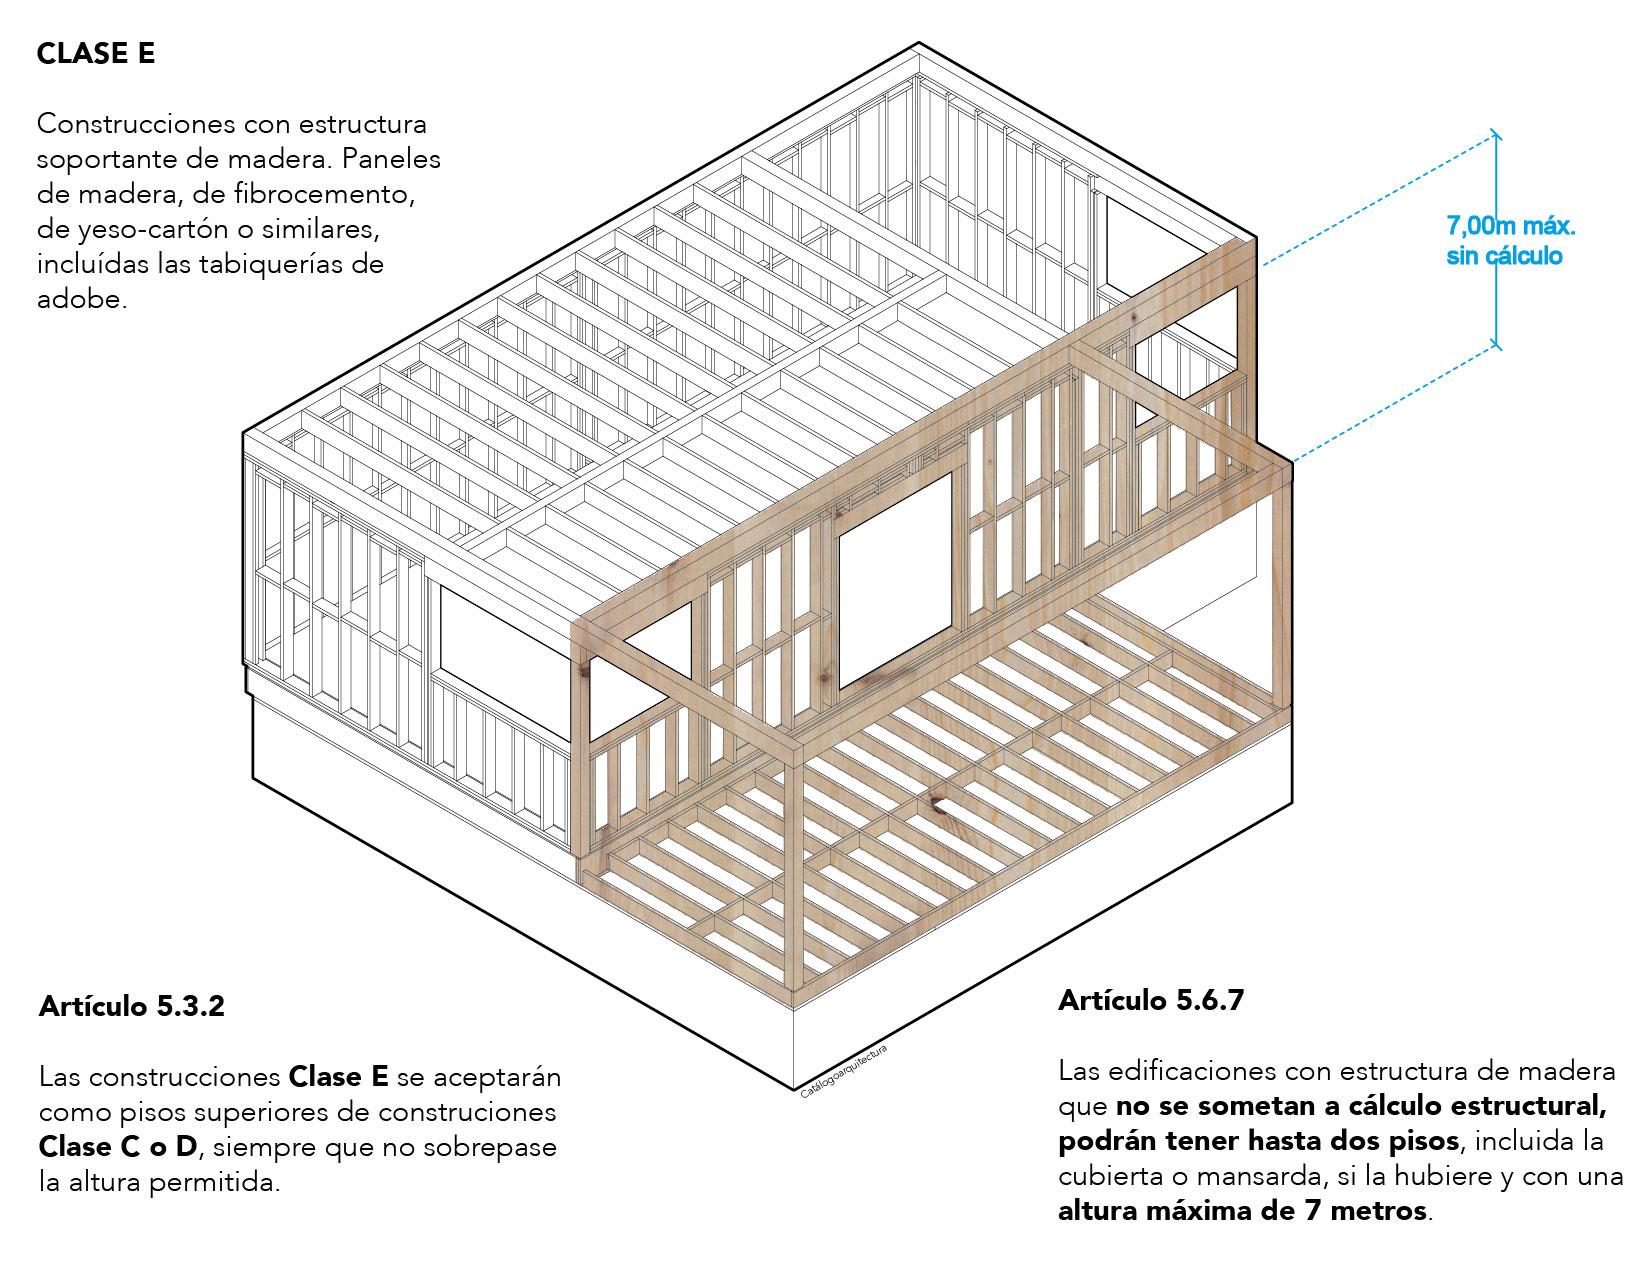 Altura construcción en madera, clase e, OGUC, Chile.